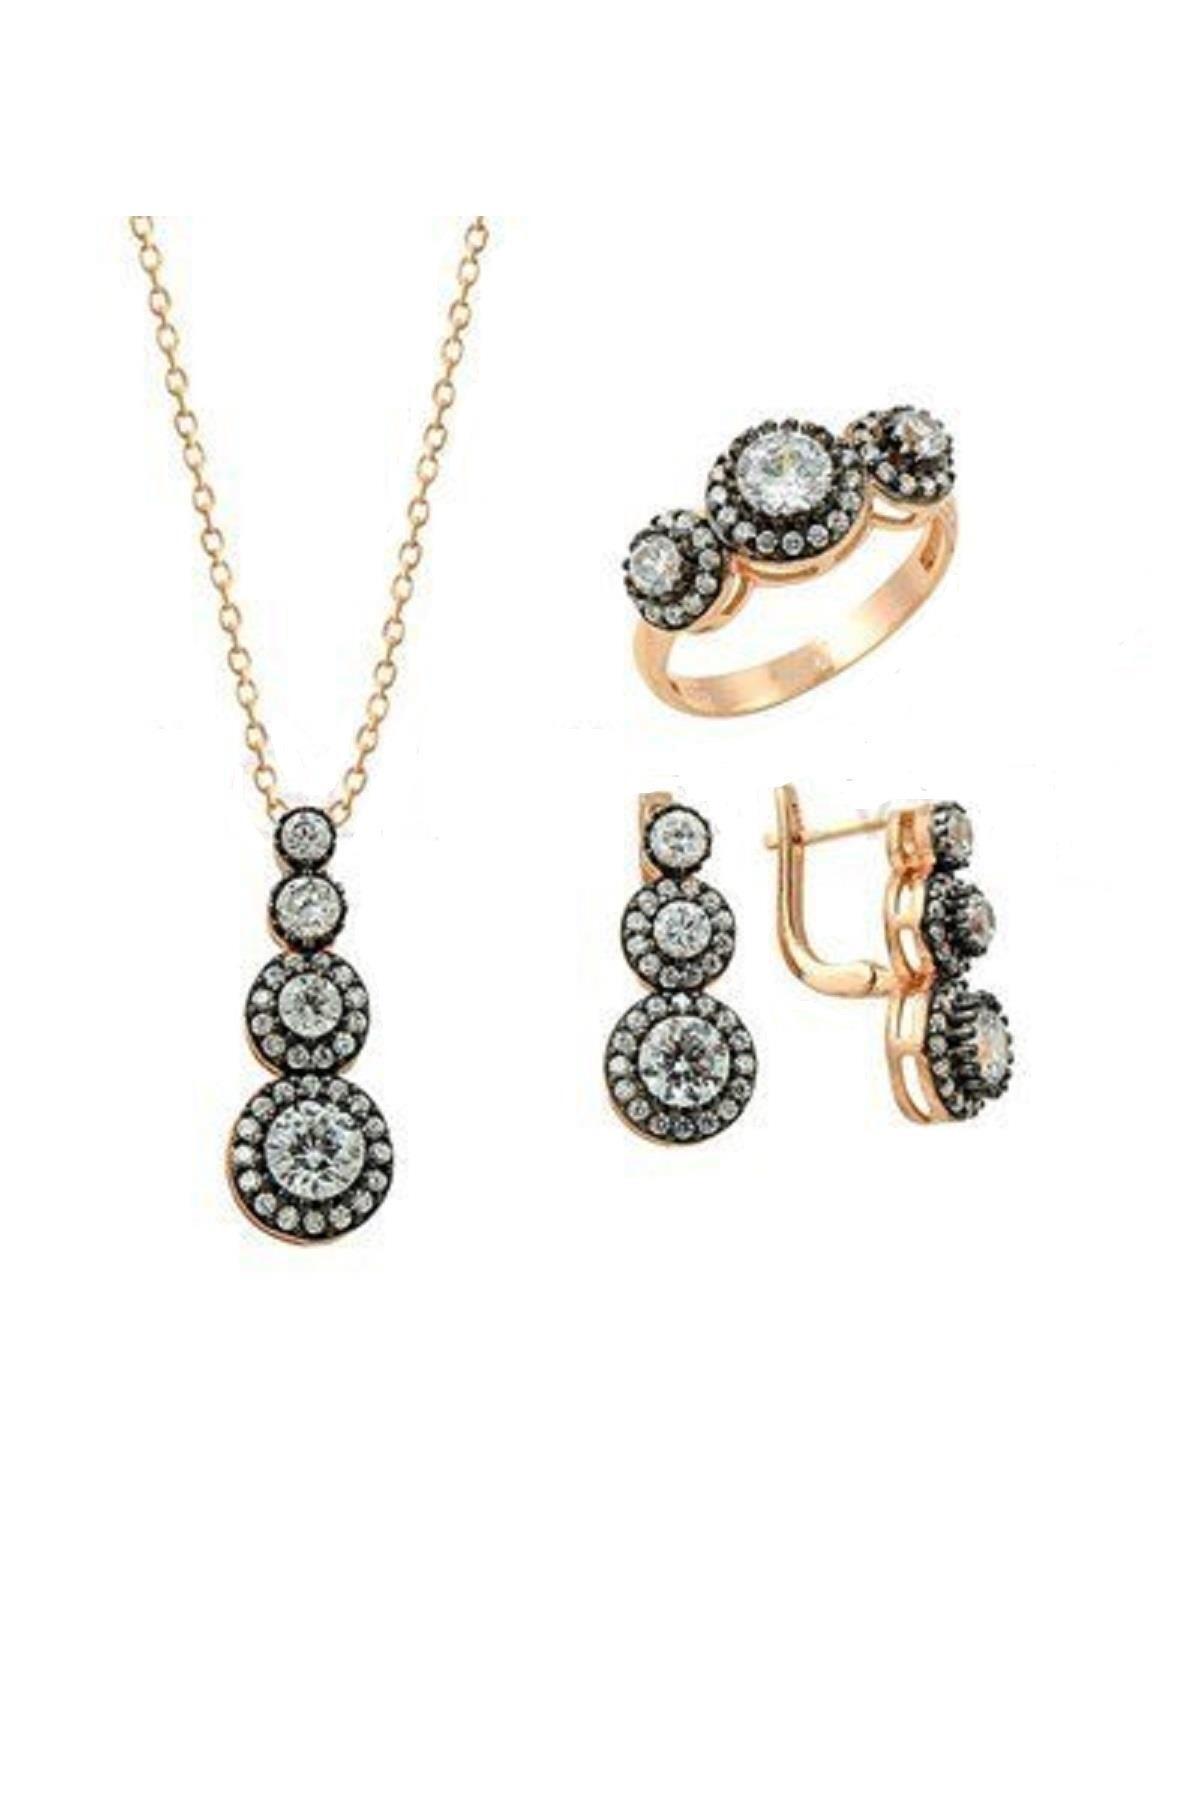 Söğütlü Silver Tria Elmas Montürlü Rose Üçlü Set 20